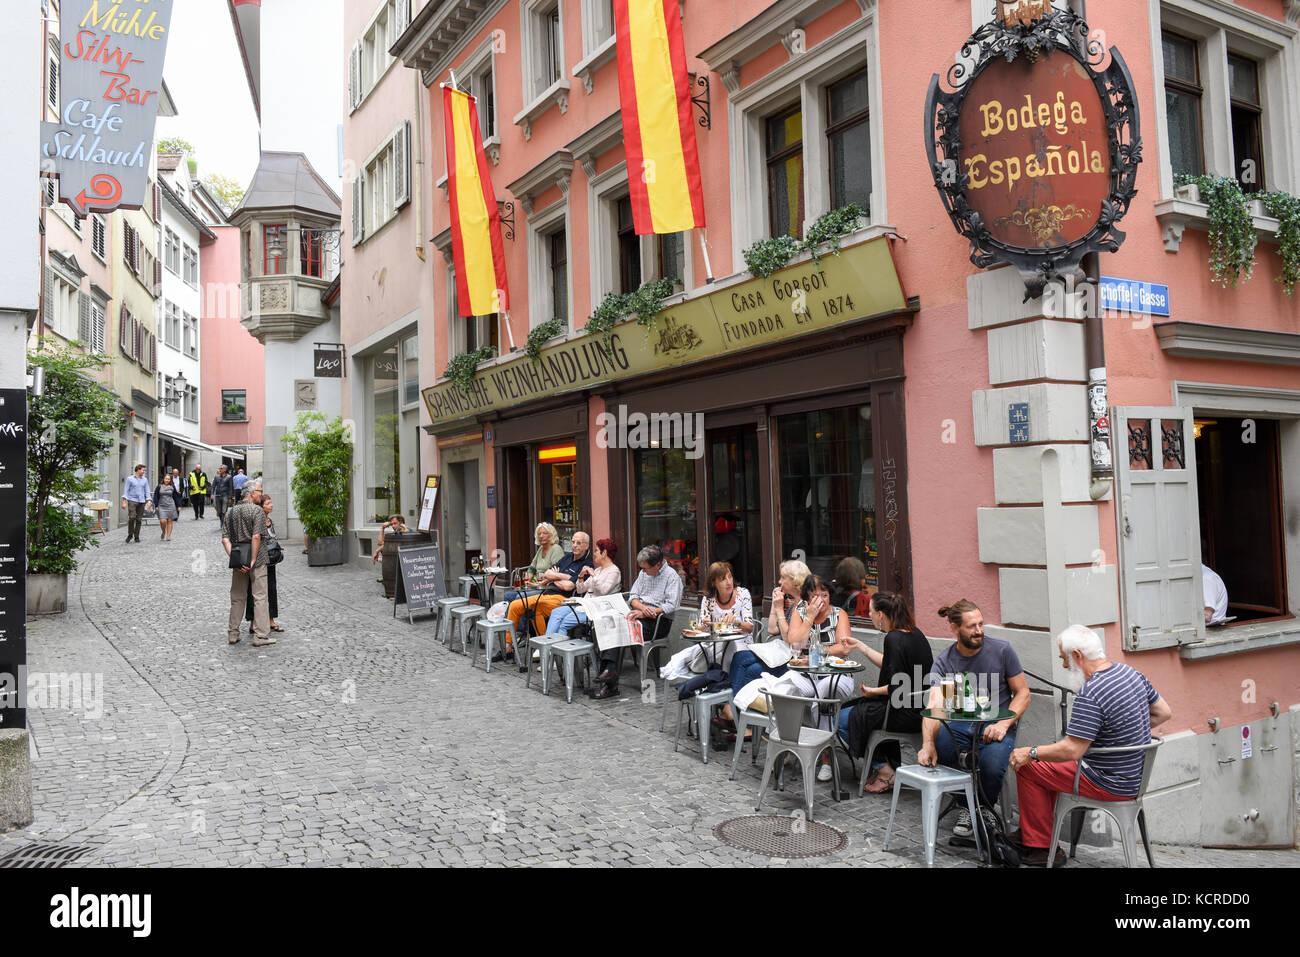 Spanish Restaurant On Church Street